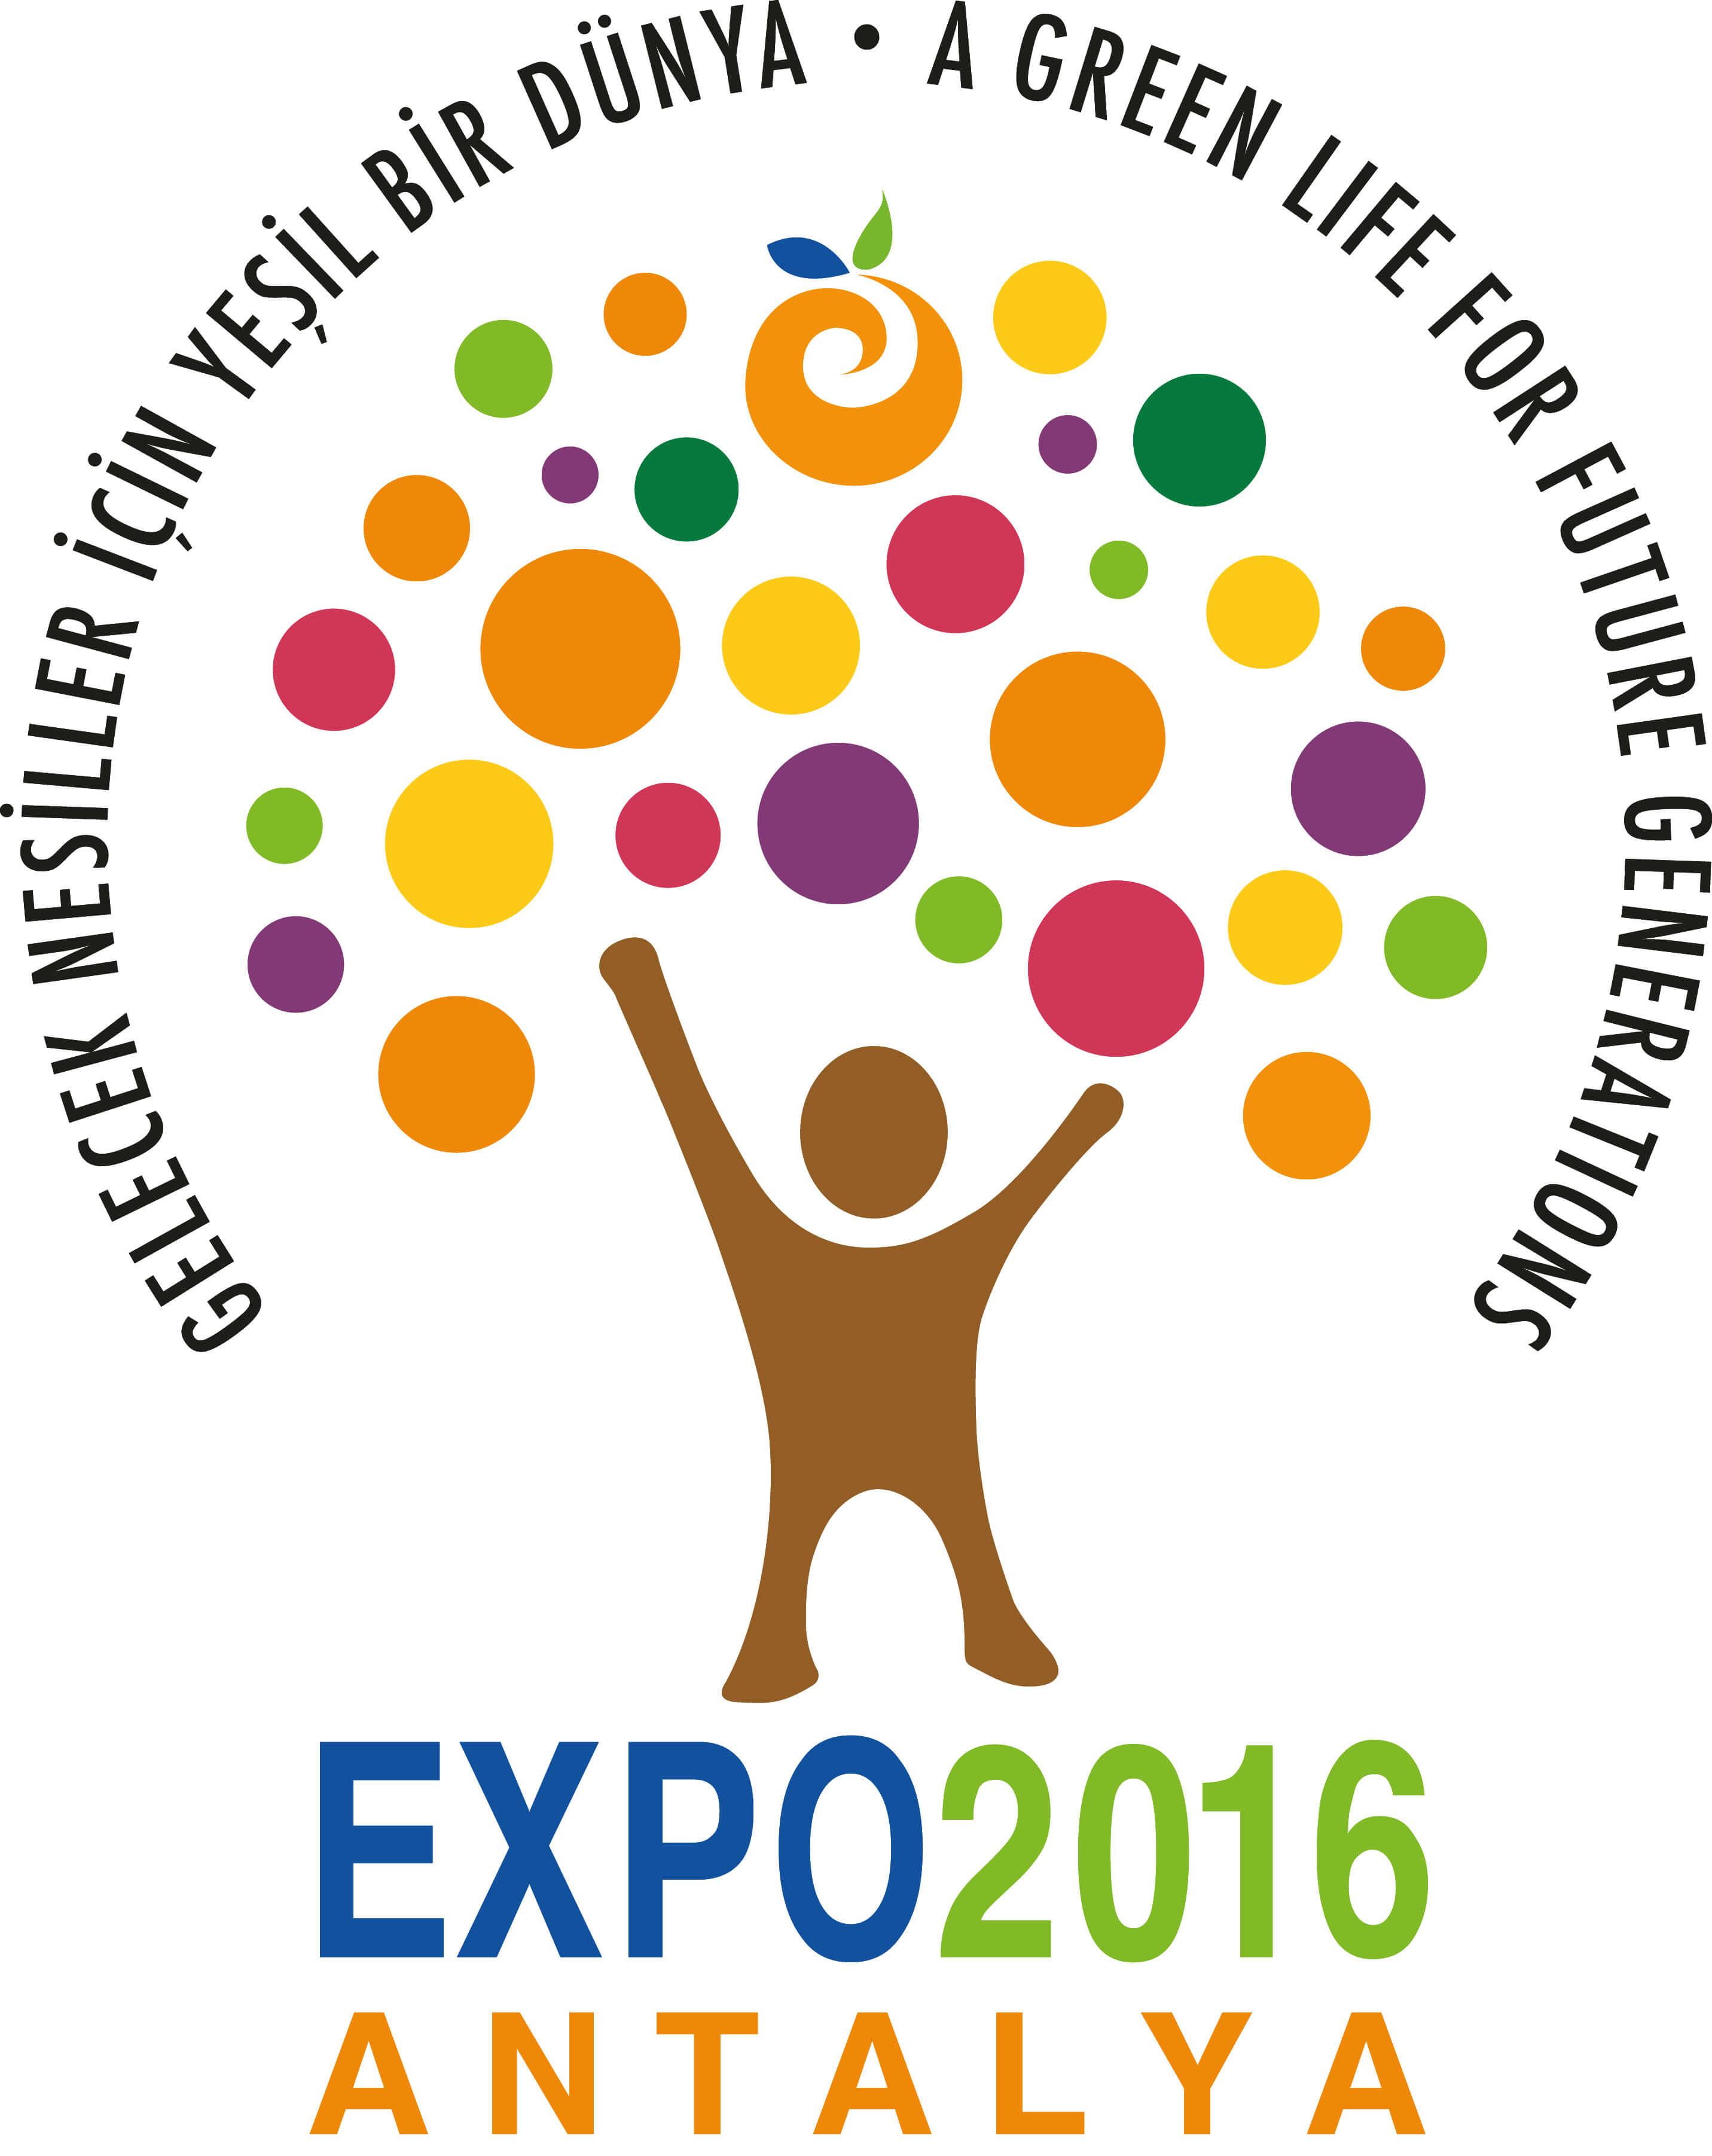 "EXPO 2016 ANTALYA ""A GREEN LIFE FOR FUTURE GENERATIONS"" 6"